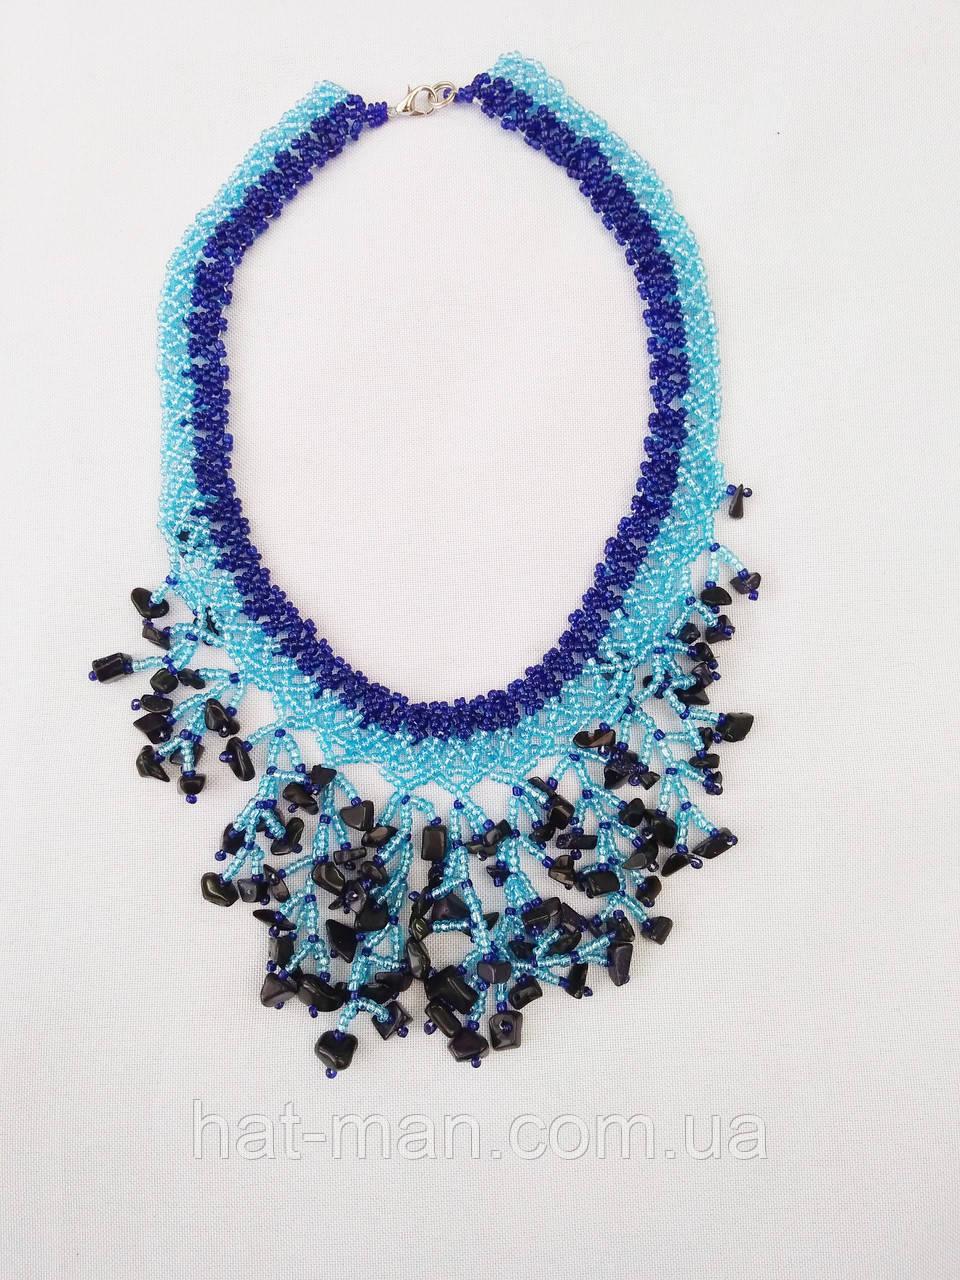 "Намисто з натурального каміння ""Небесна блакить"" (синьо-блакитне)"